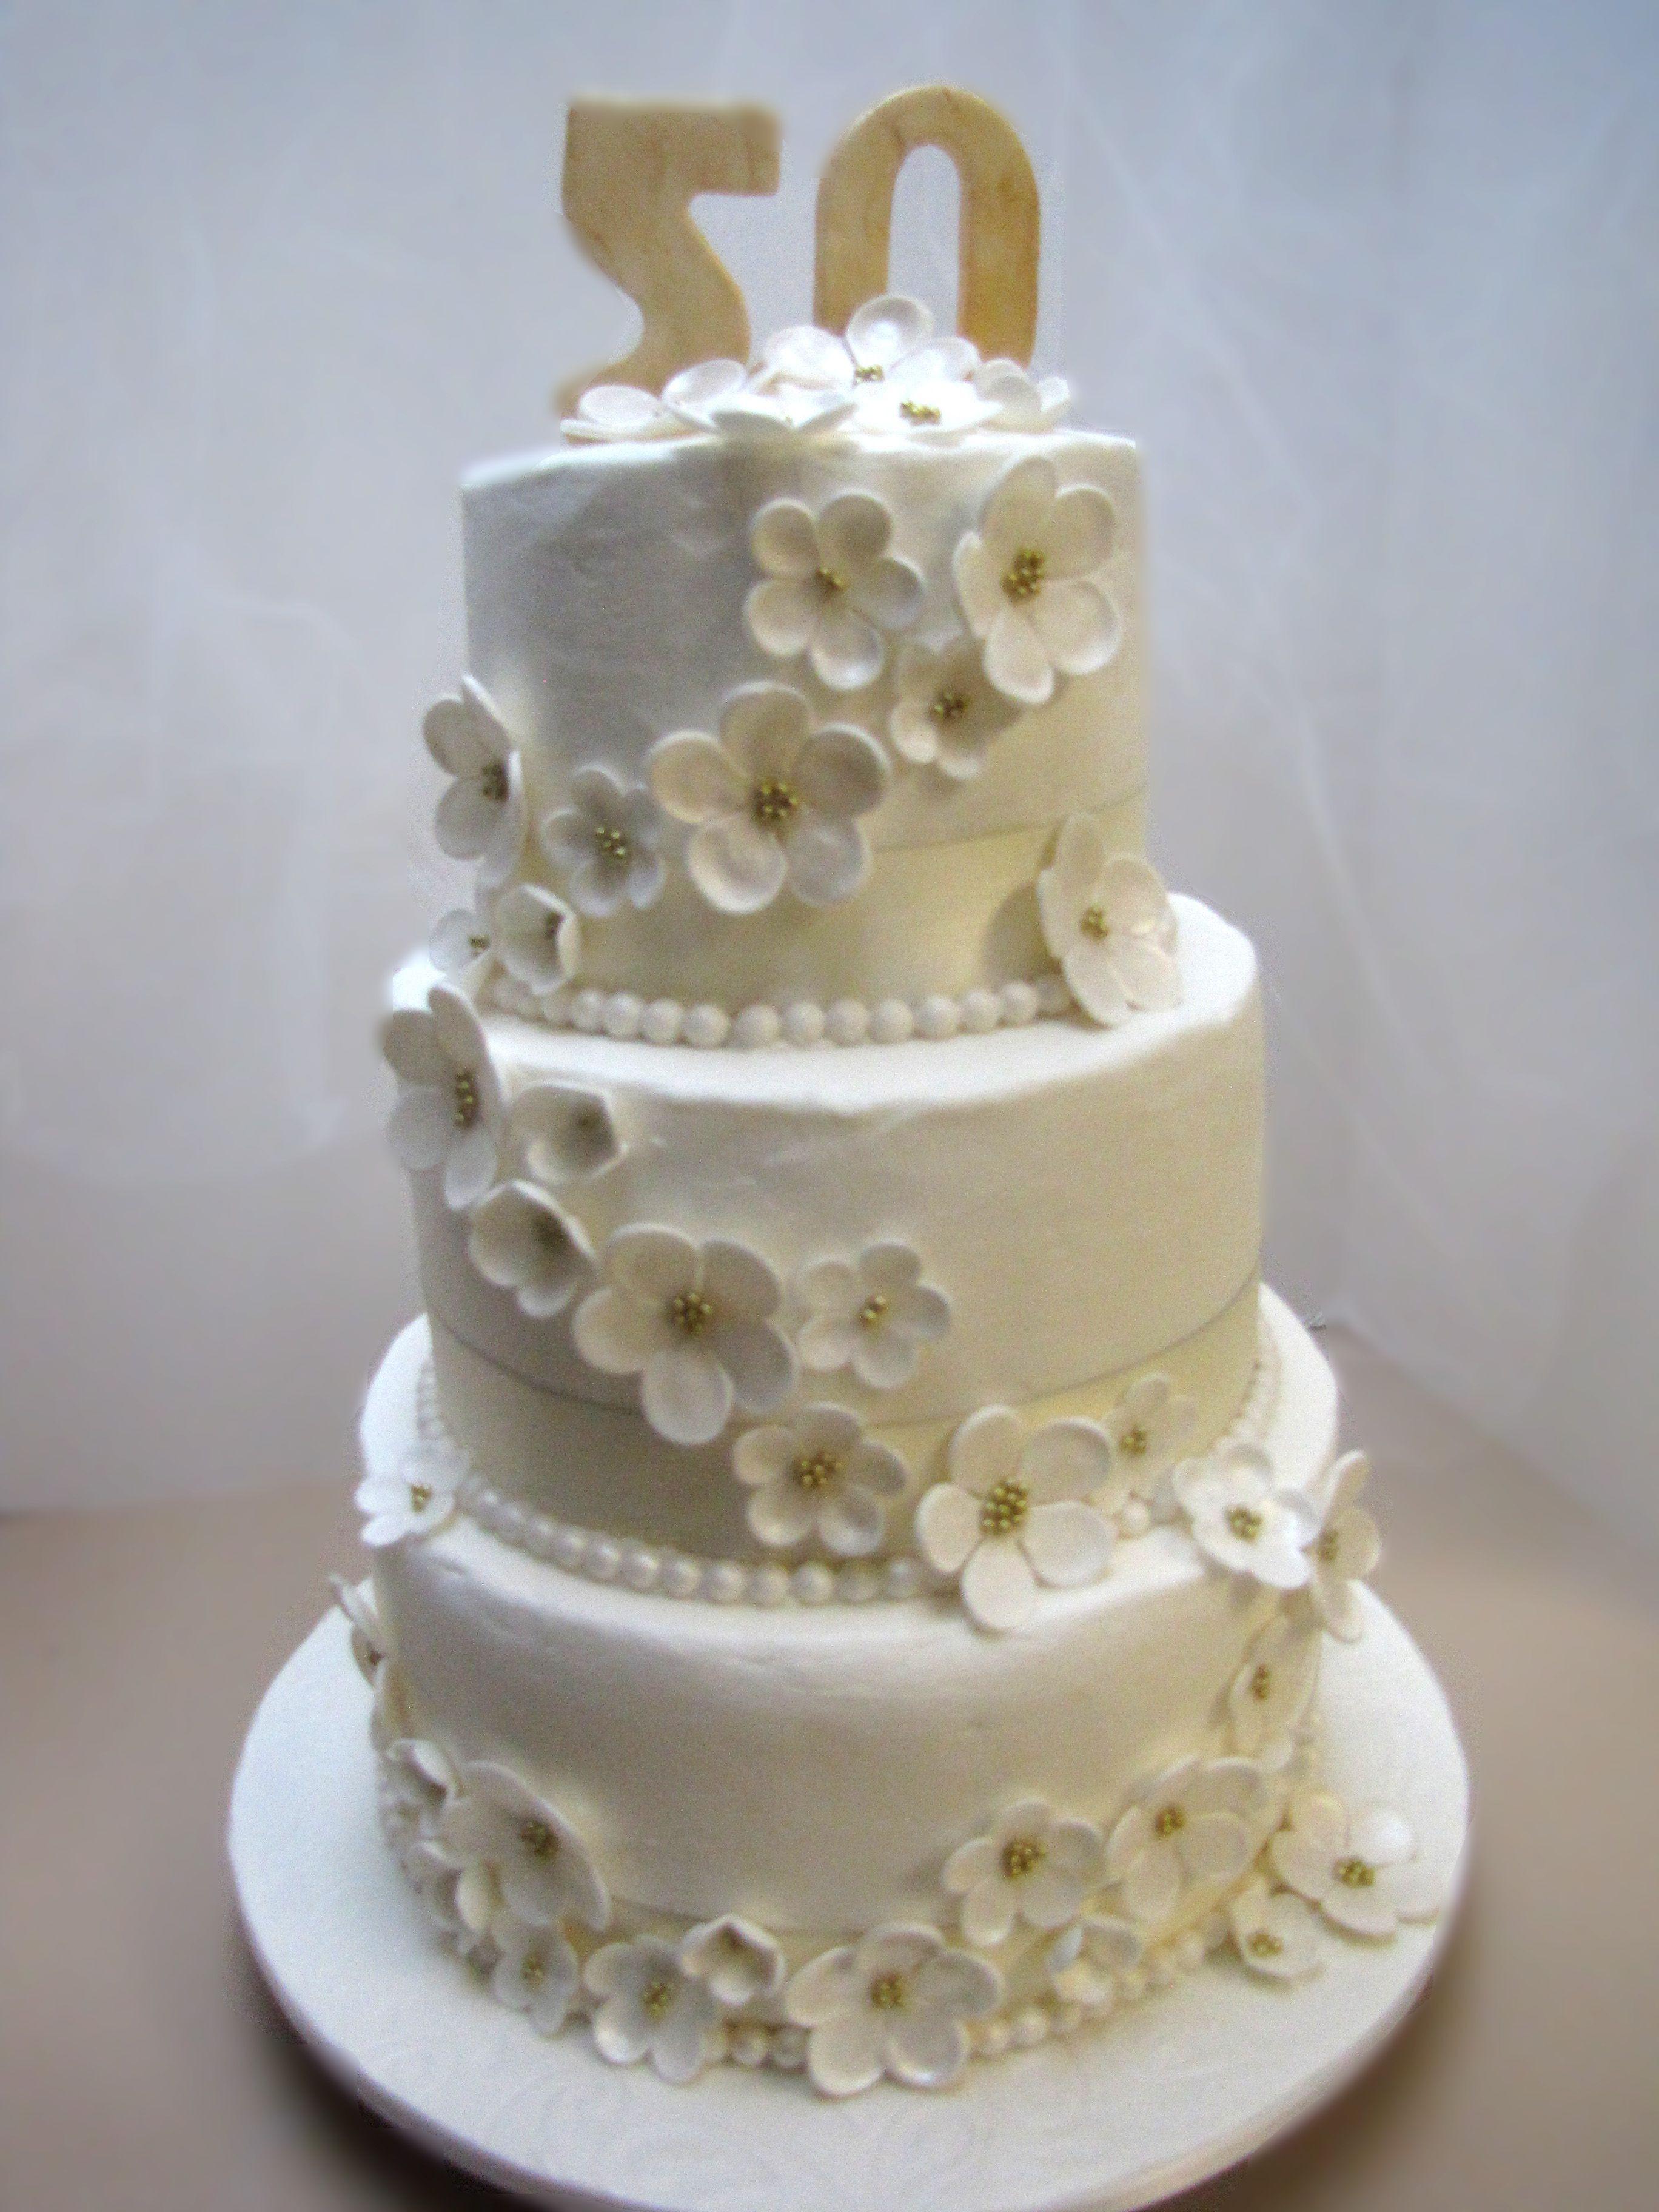 50Th Wedding Cakes  50th anniversary cakes